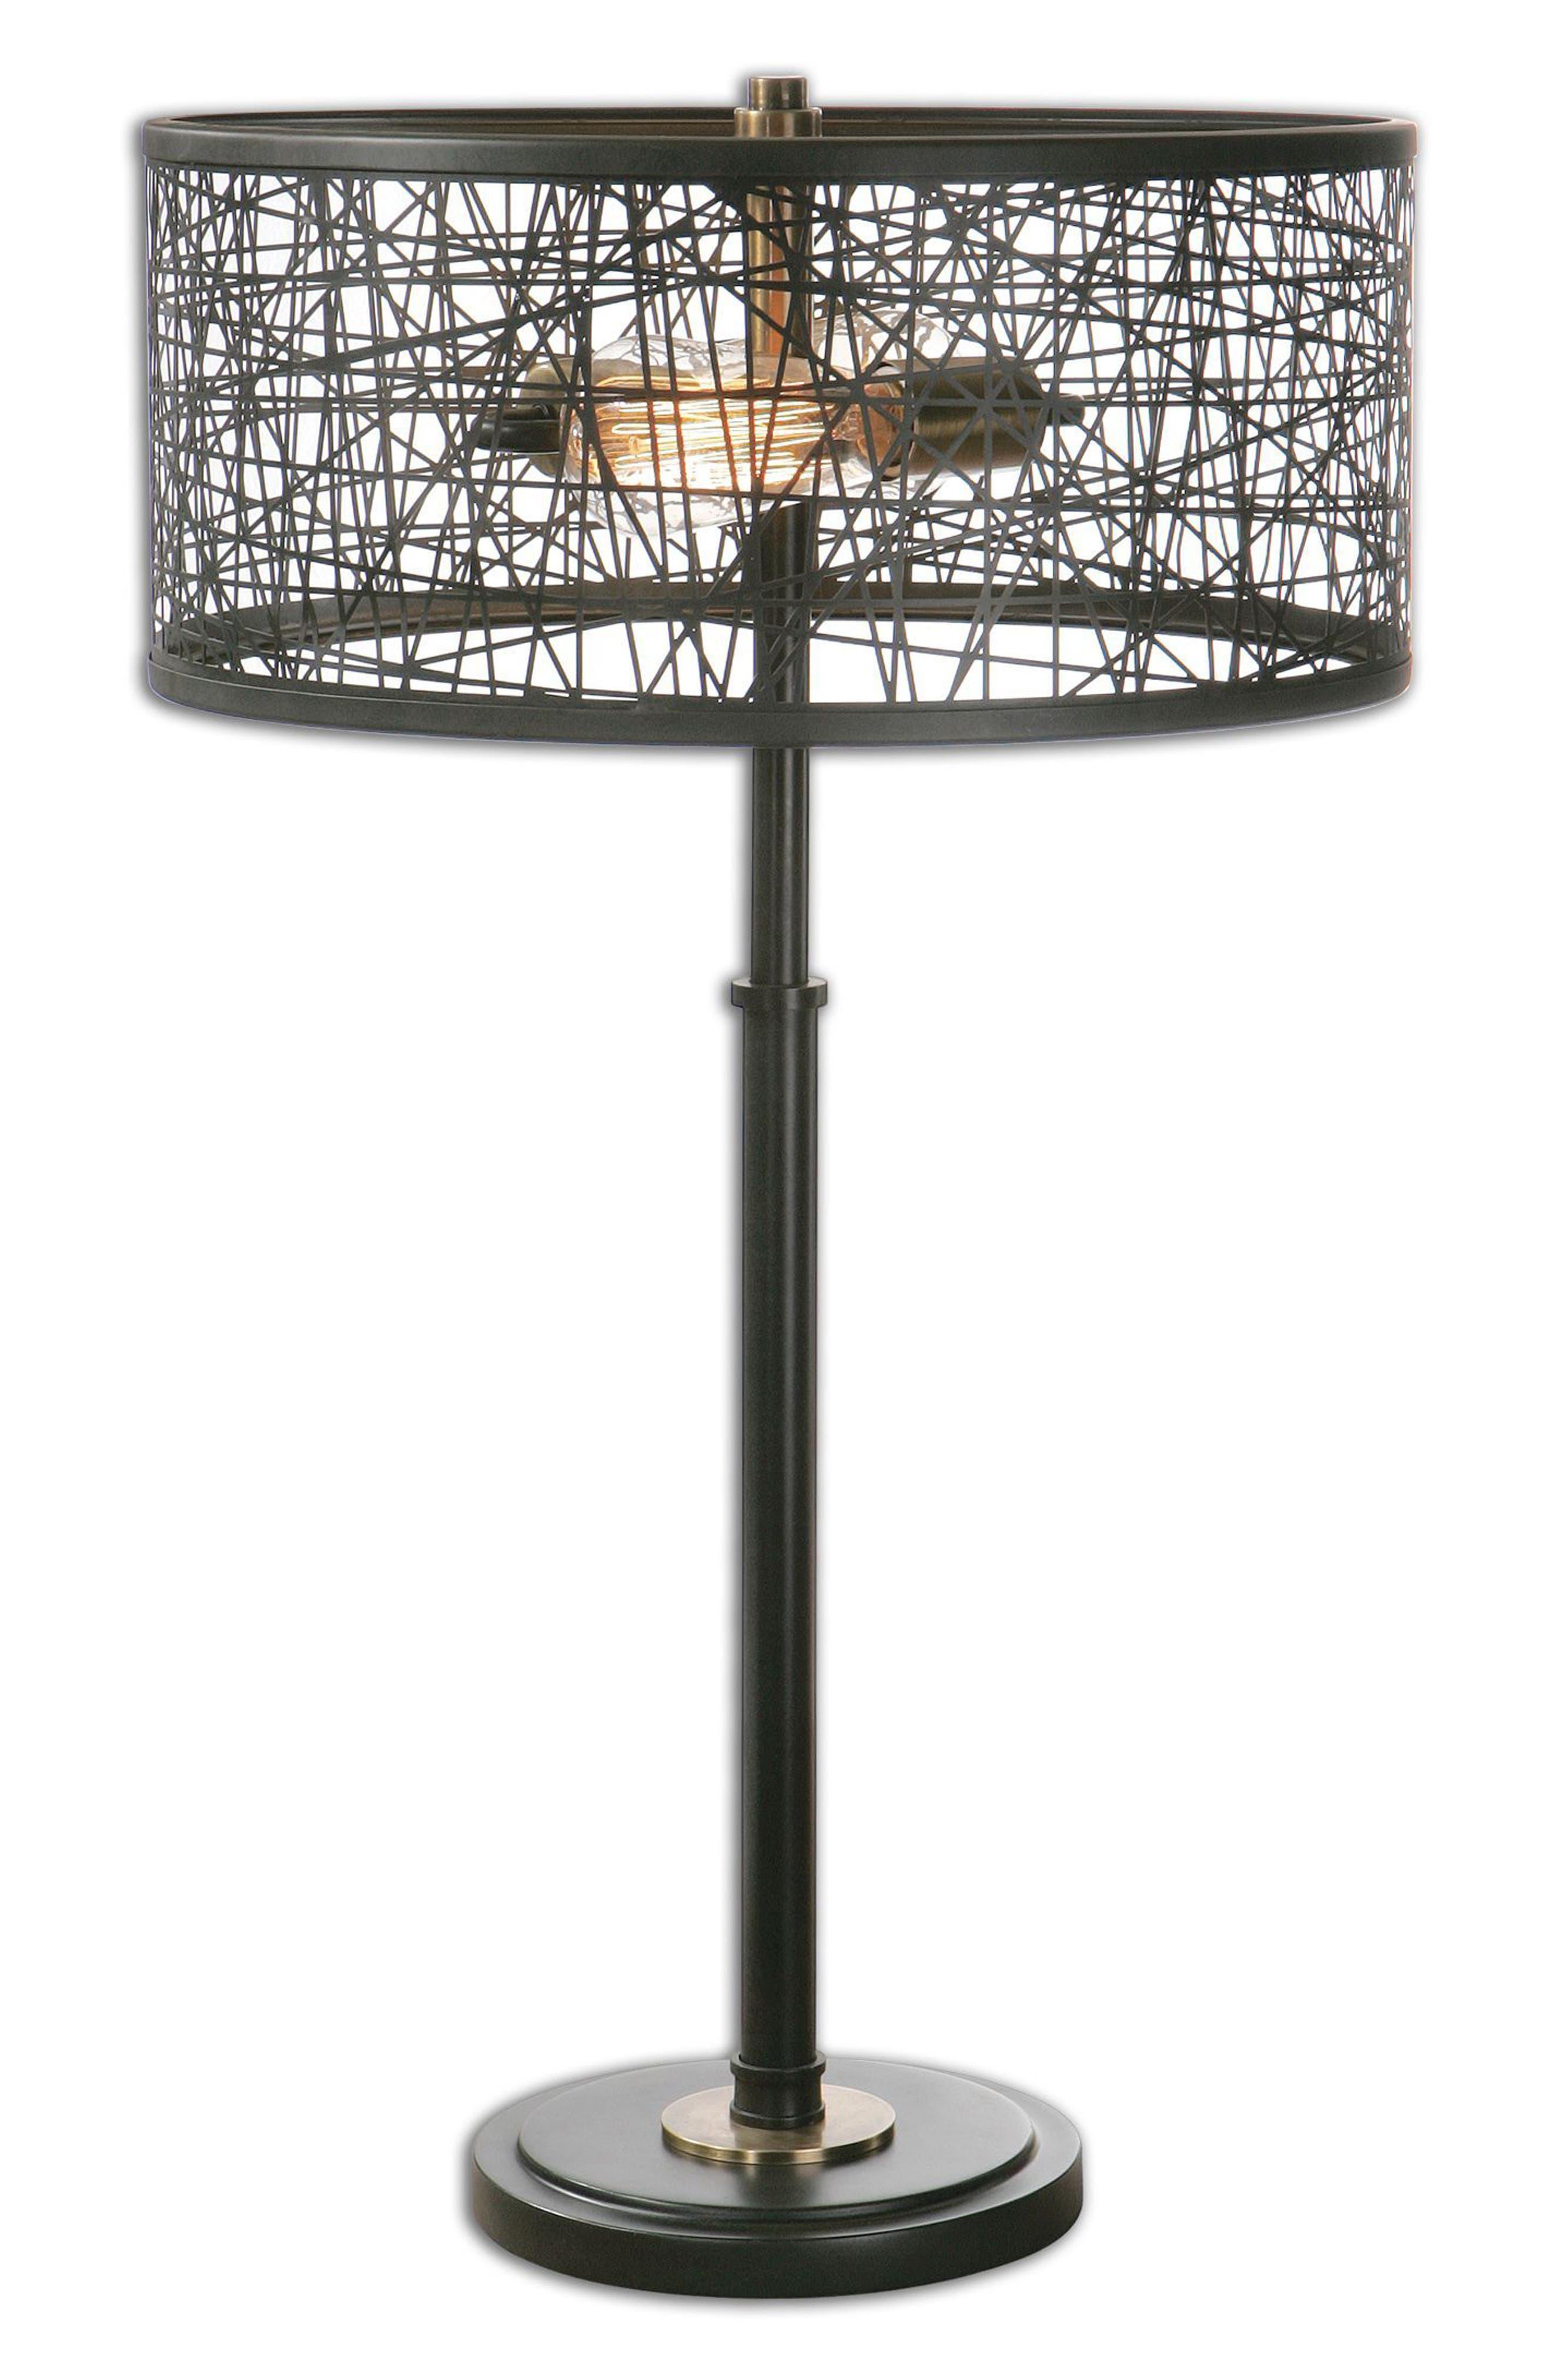 Alternate Image 1 Selected - Uttermost Alita Table Lamp